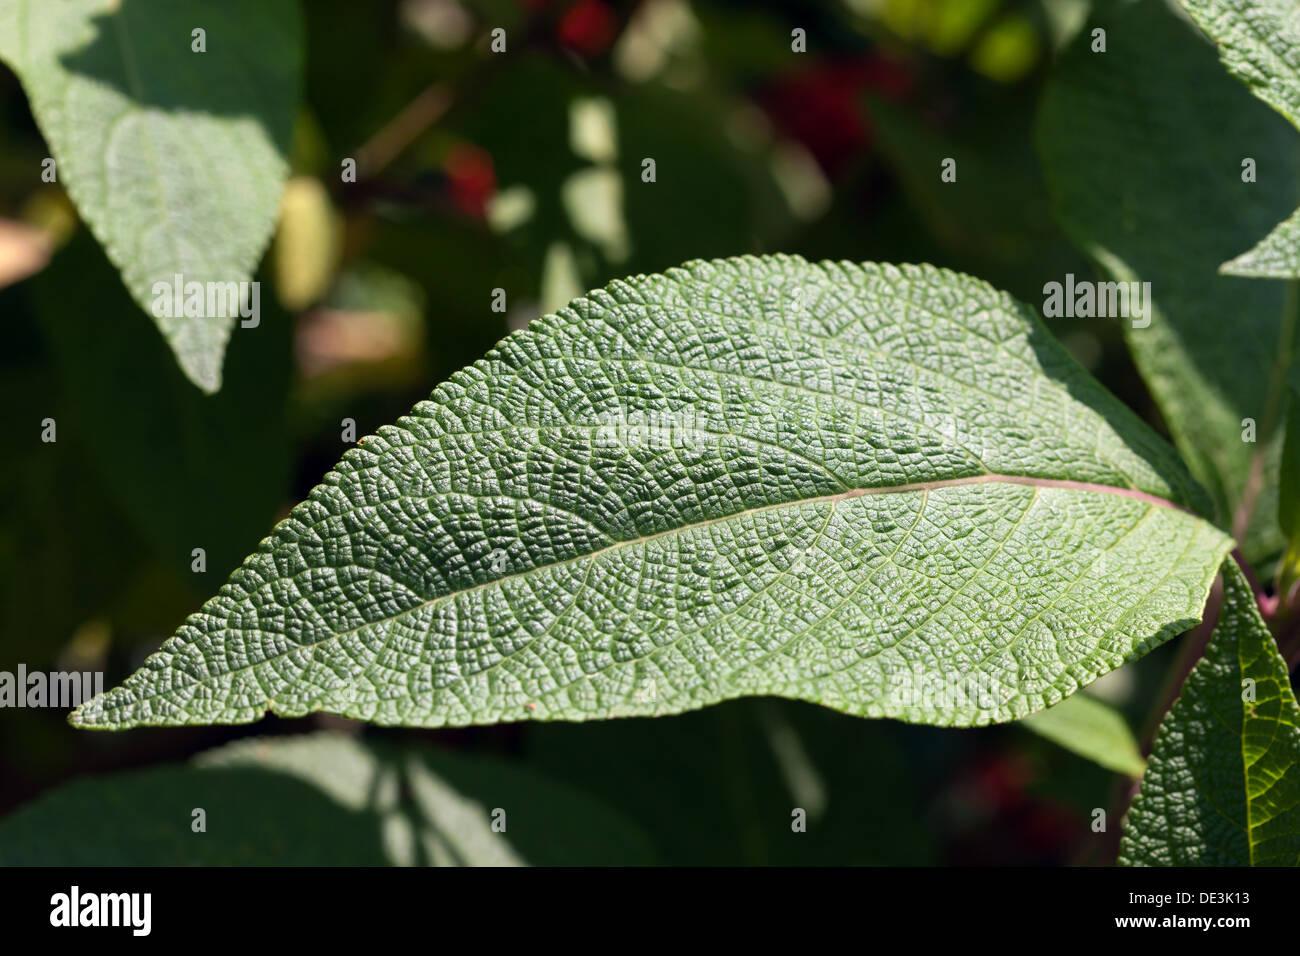 Textured  leaf patterns. - Stock Image